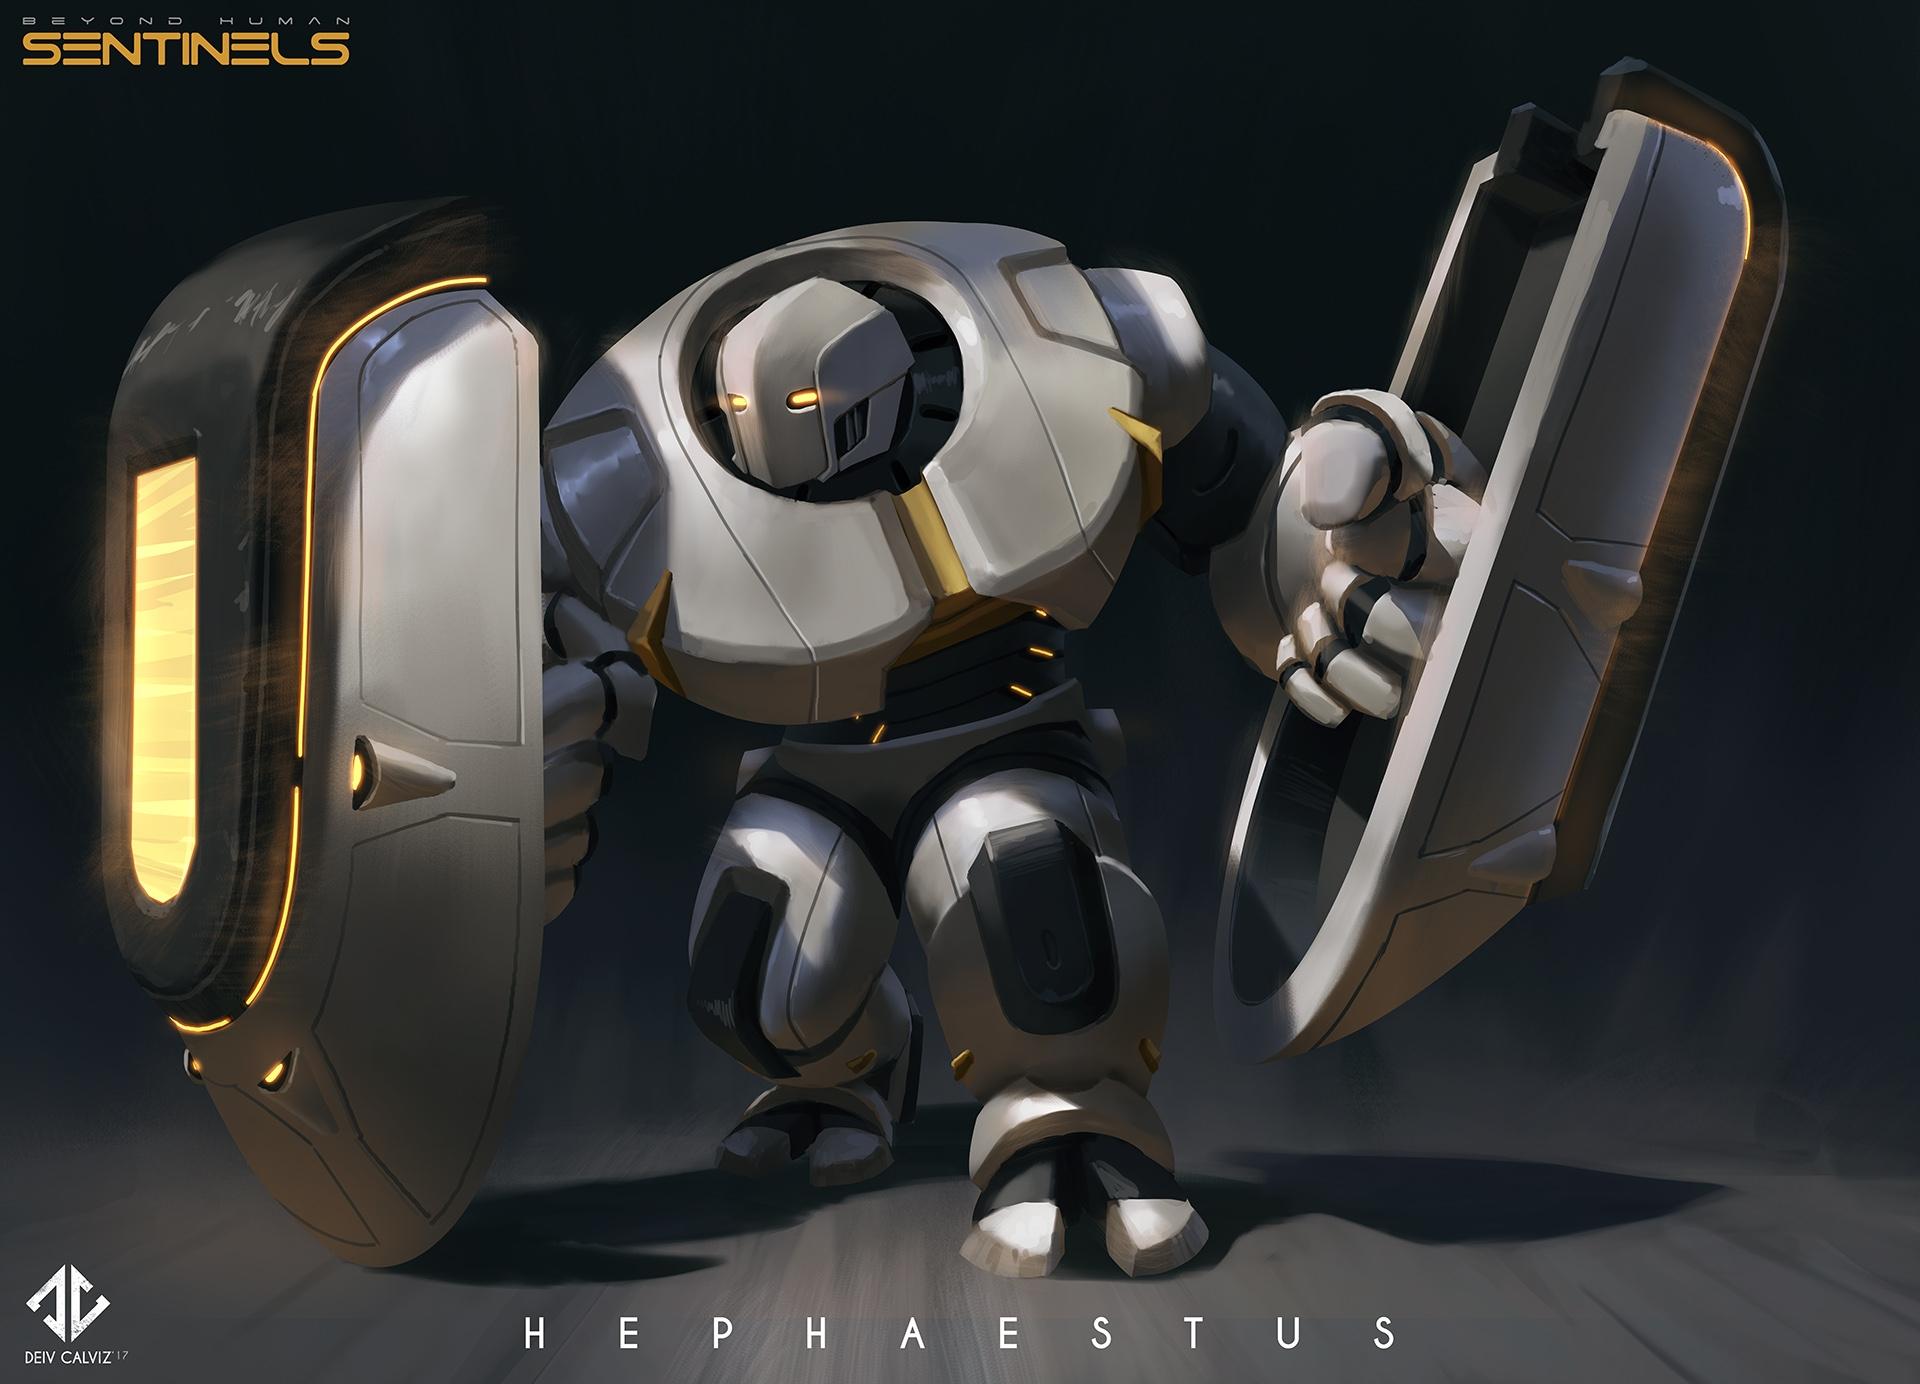 Sentinels_1_Hephaestus